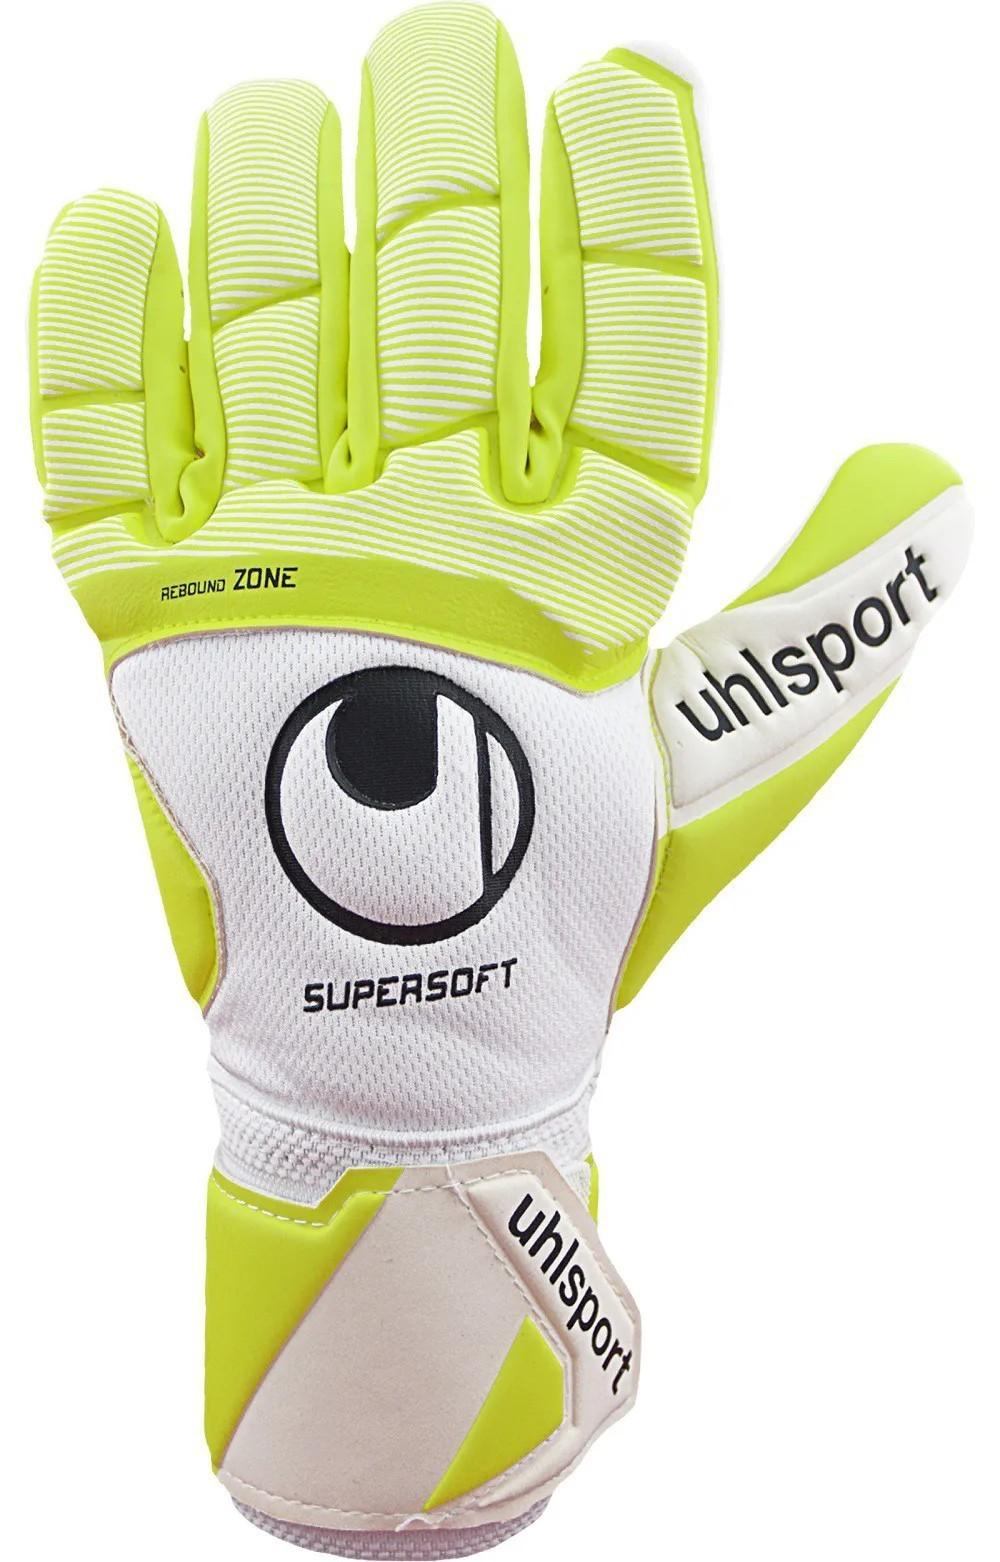 Luva Uhlsport Pure Alliance Supersoft Hn